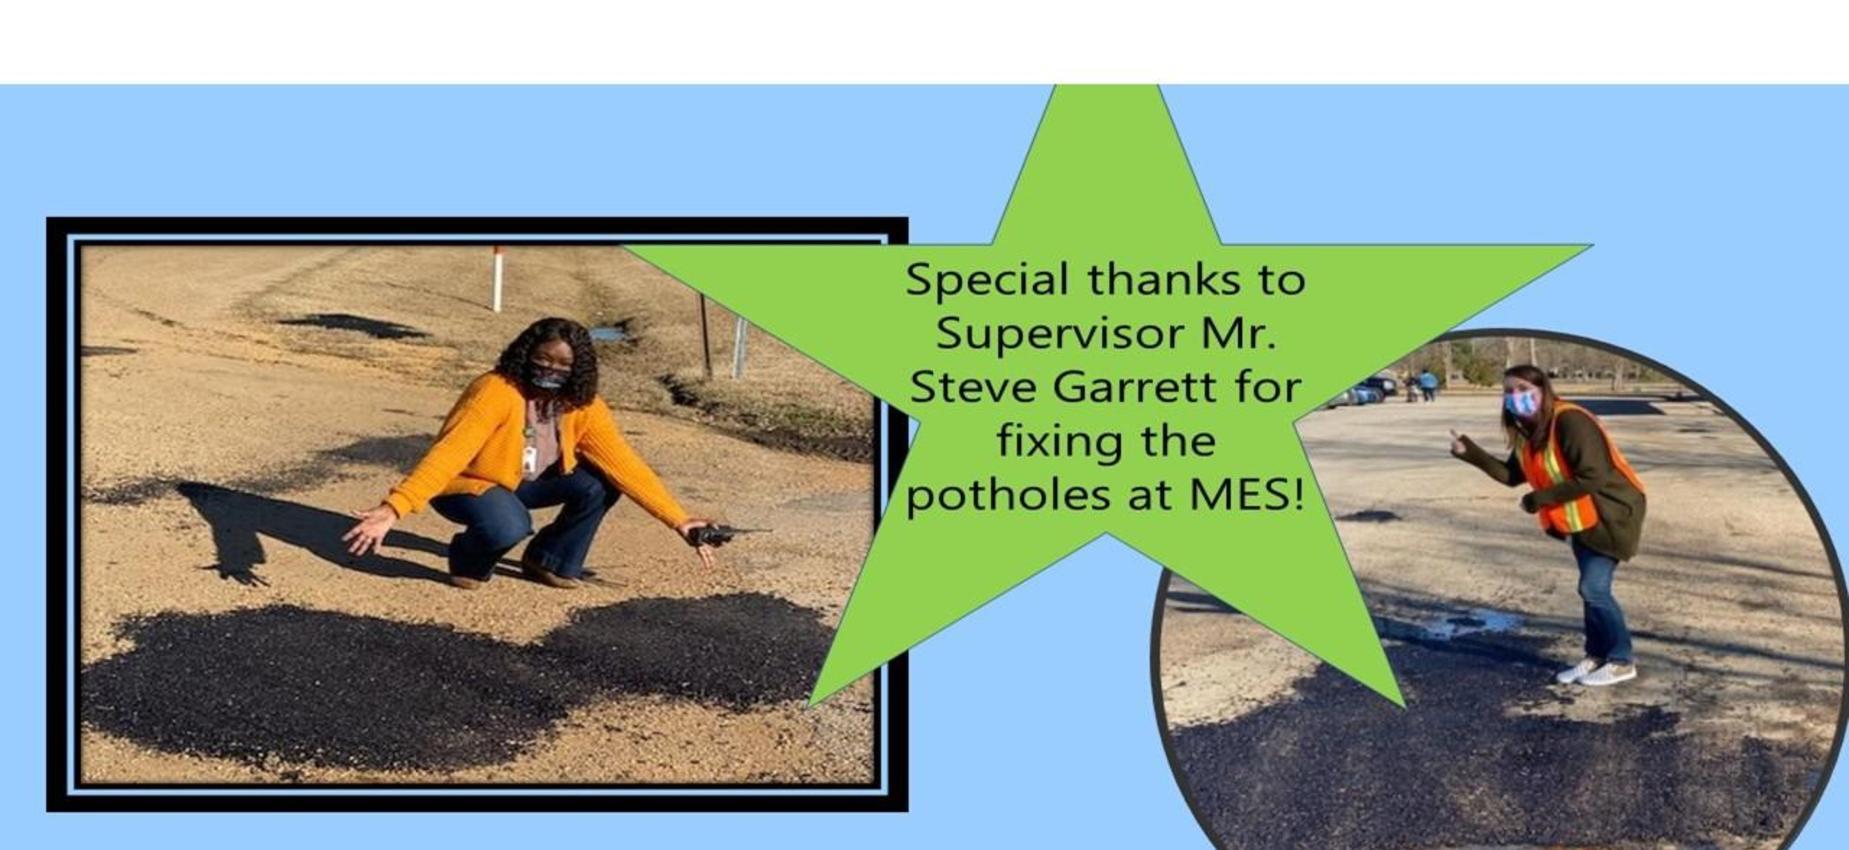 Special thanks to Supervisor Mr. Steve Garrett for fixing the potholes at MES!